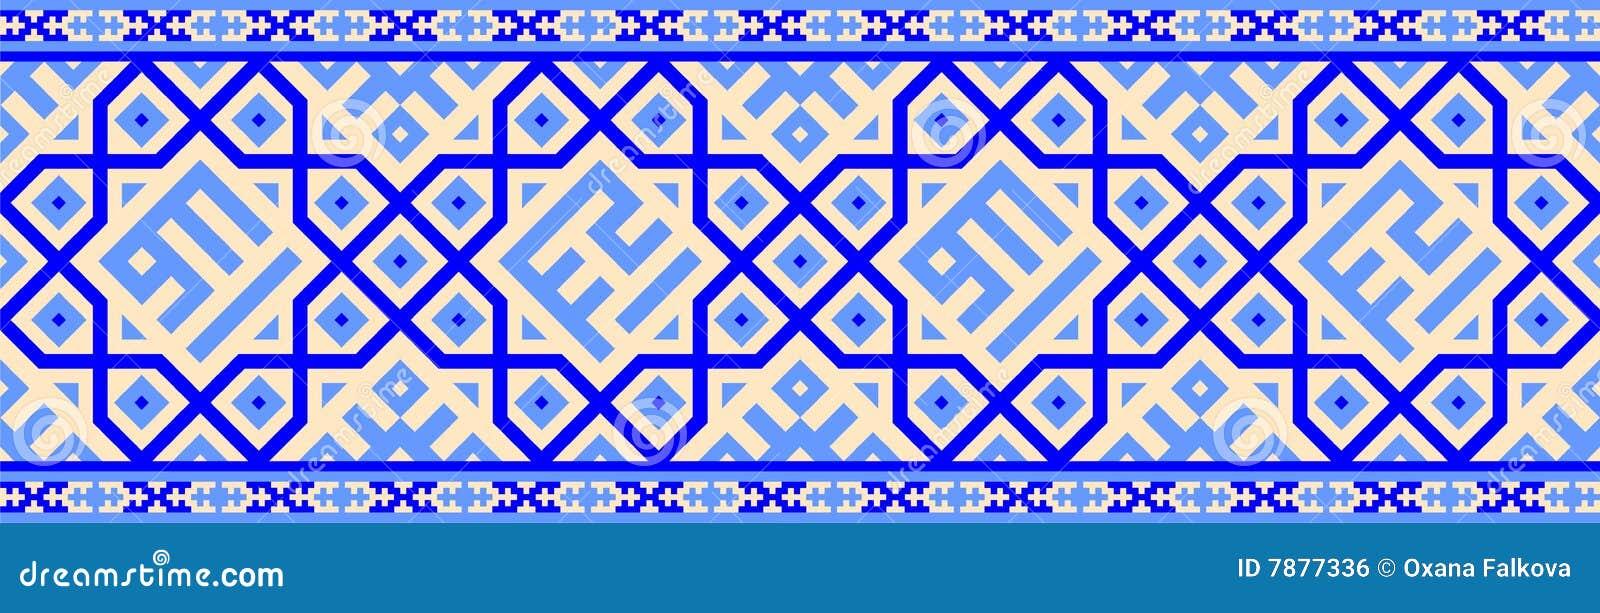 Arab geometric pattern